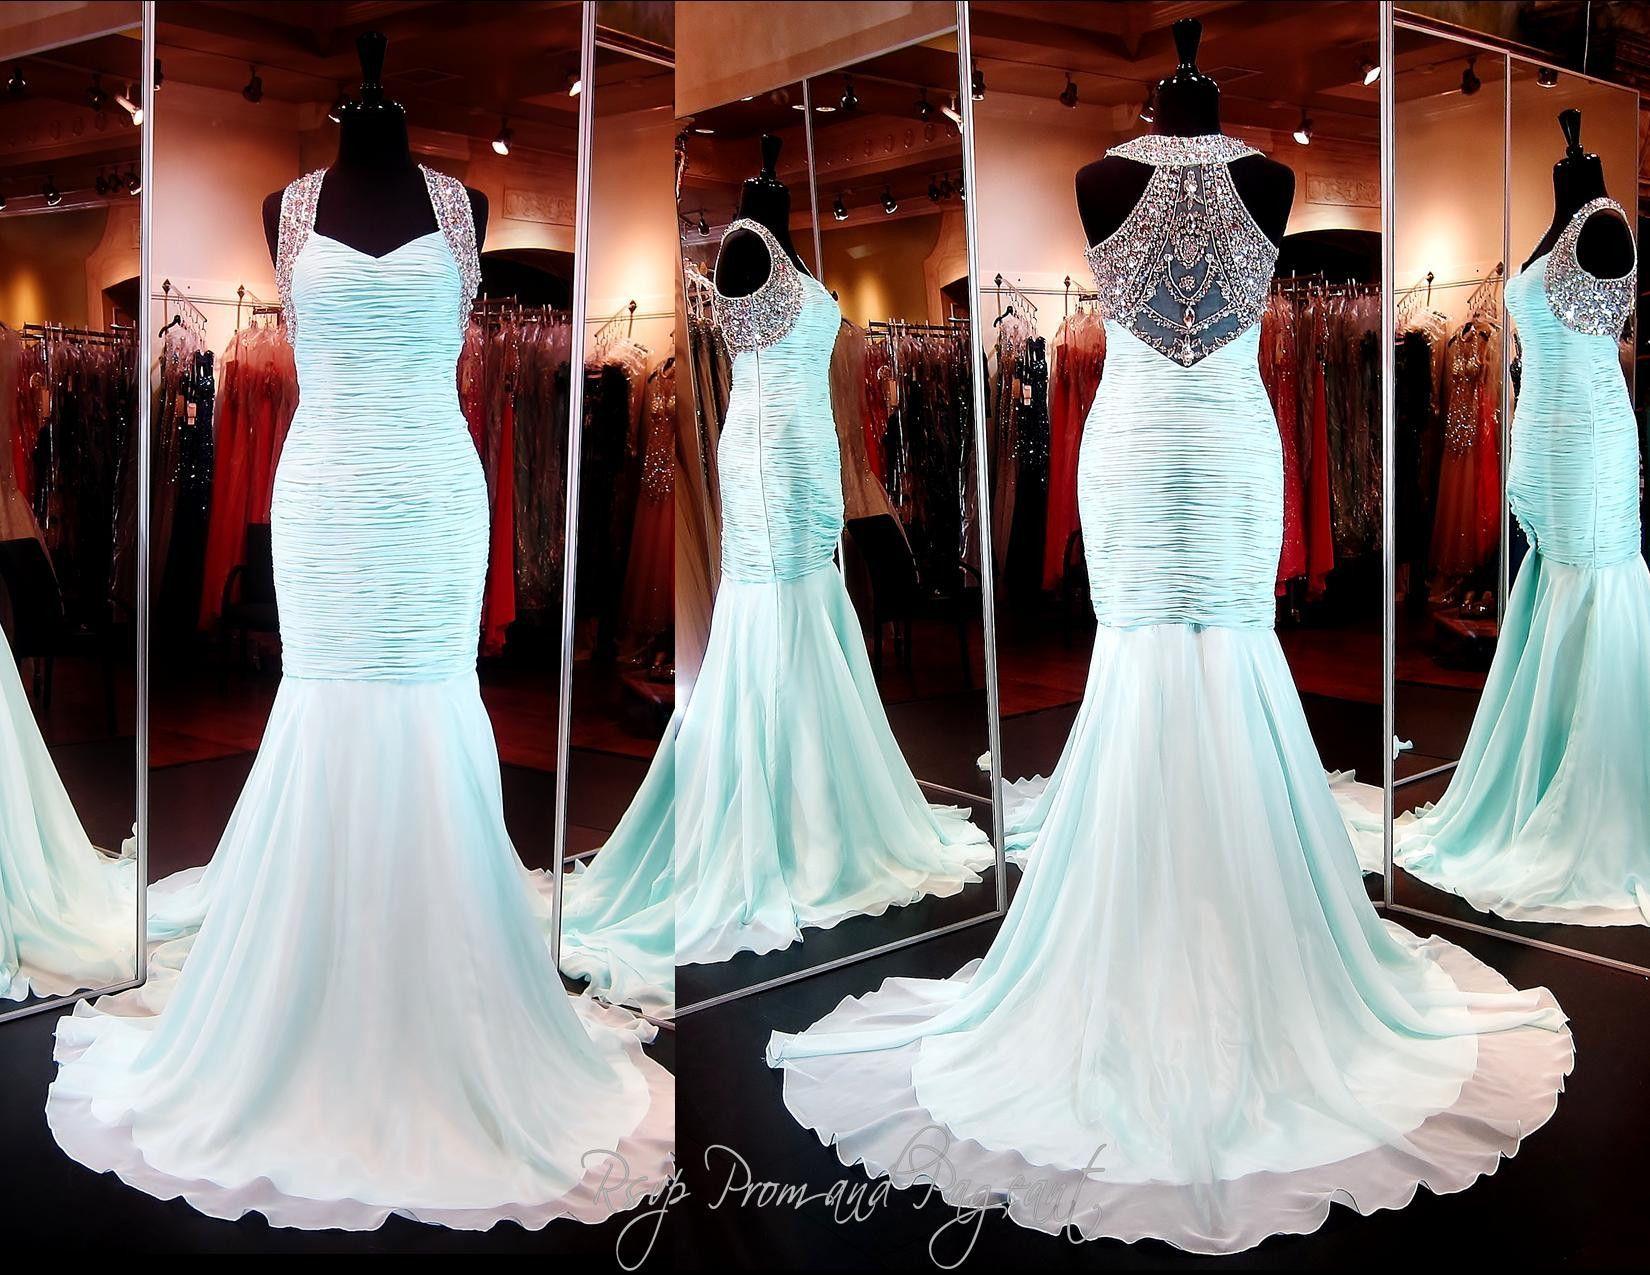 115col010120399 Aqua Prom Dresses Atlanta Pageant Dresses Aqua Prom Dress